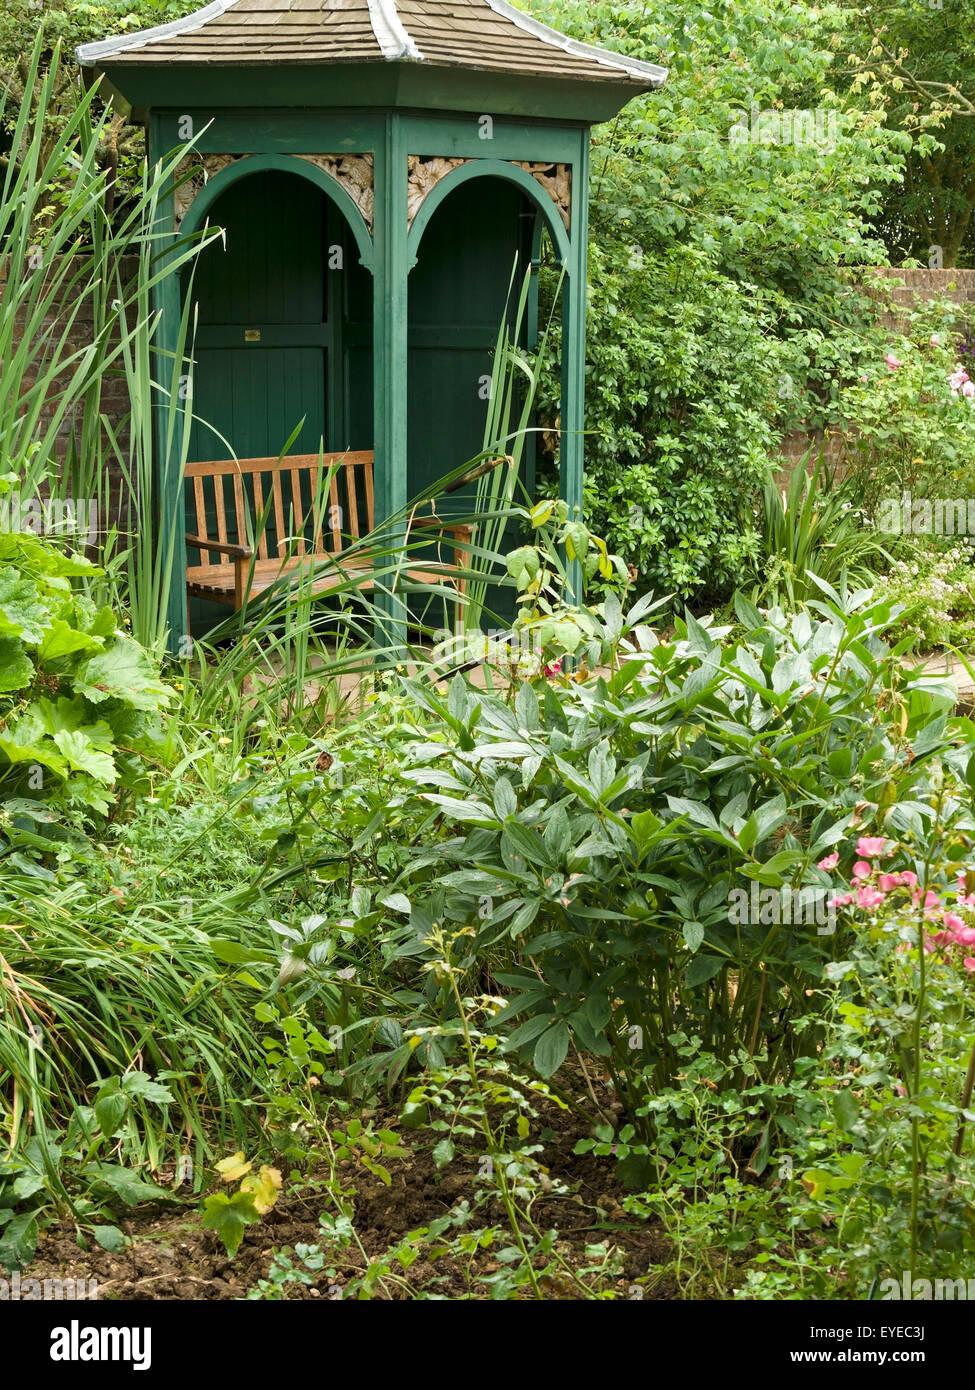 Ornate Arched Wooden Garden Gazebo Arbor Amongst